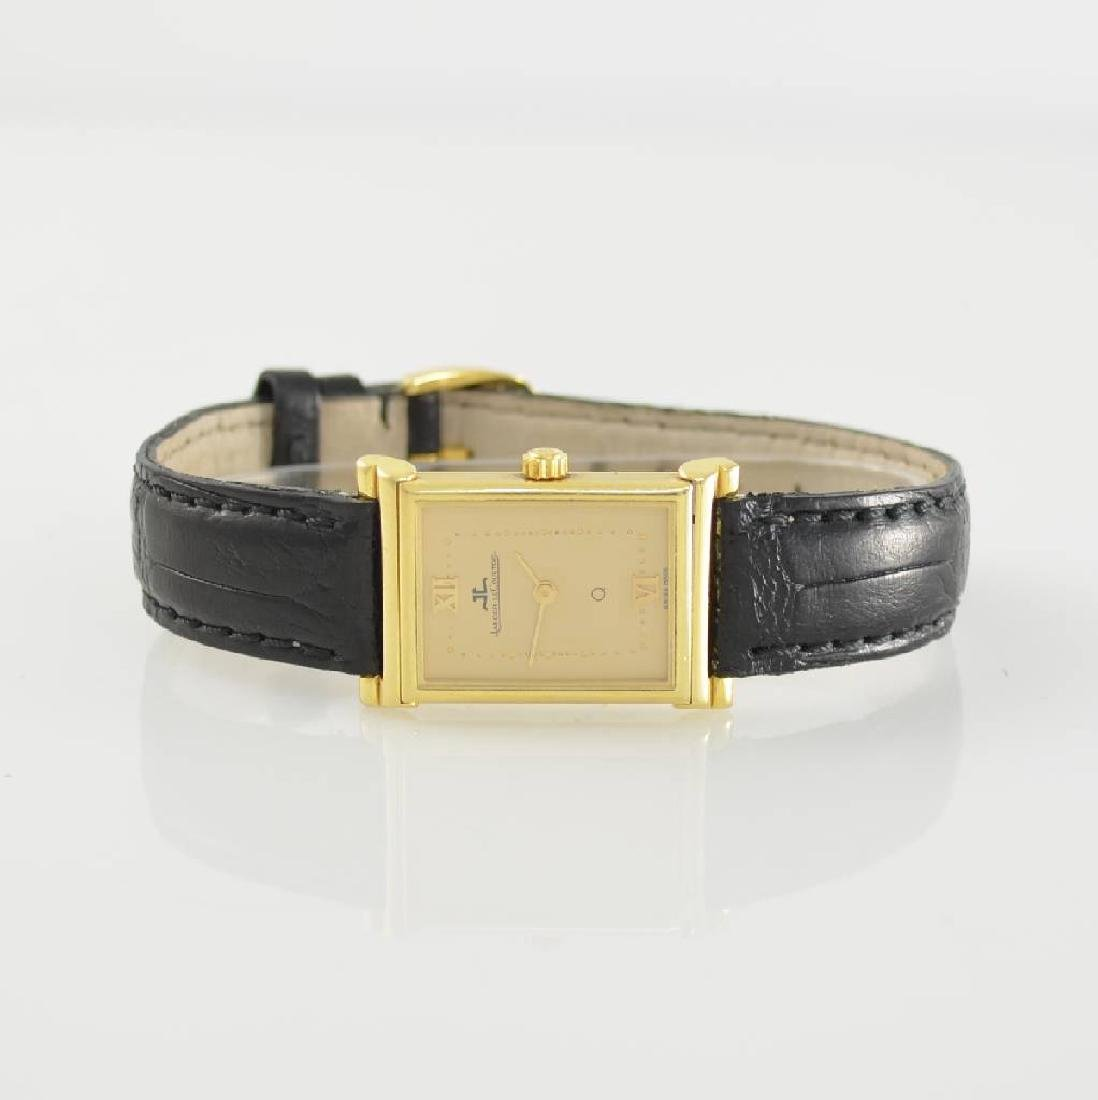 Jaeger-LeCoultre rectangular 18k gold ladies wristwatch